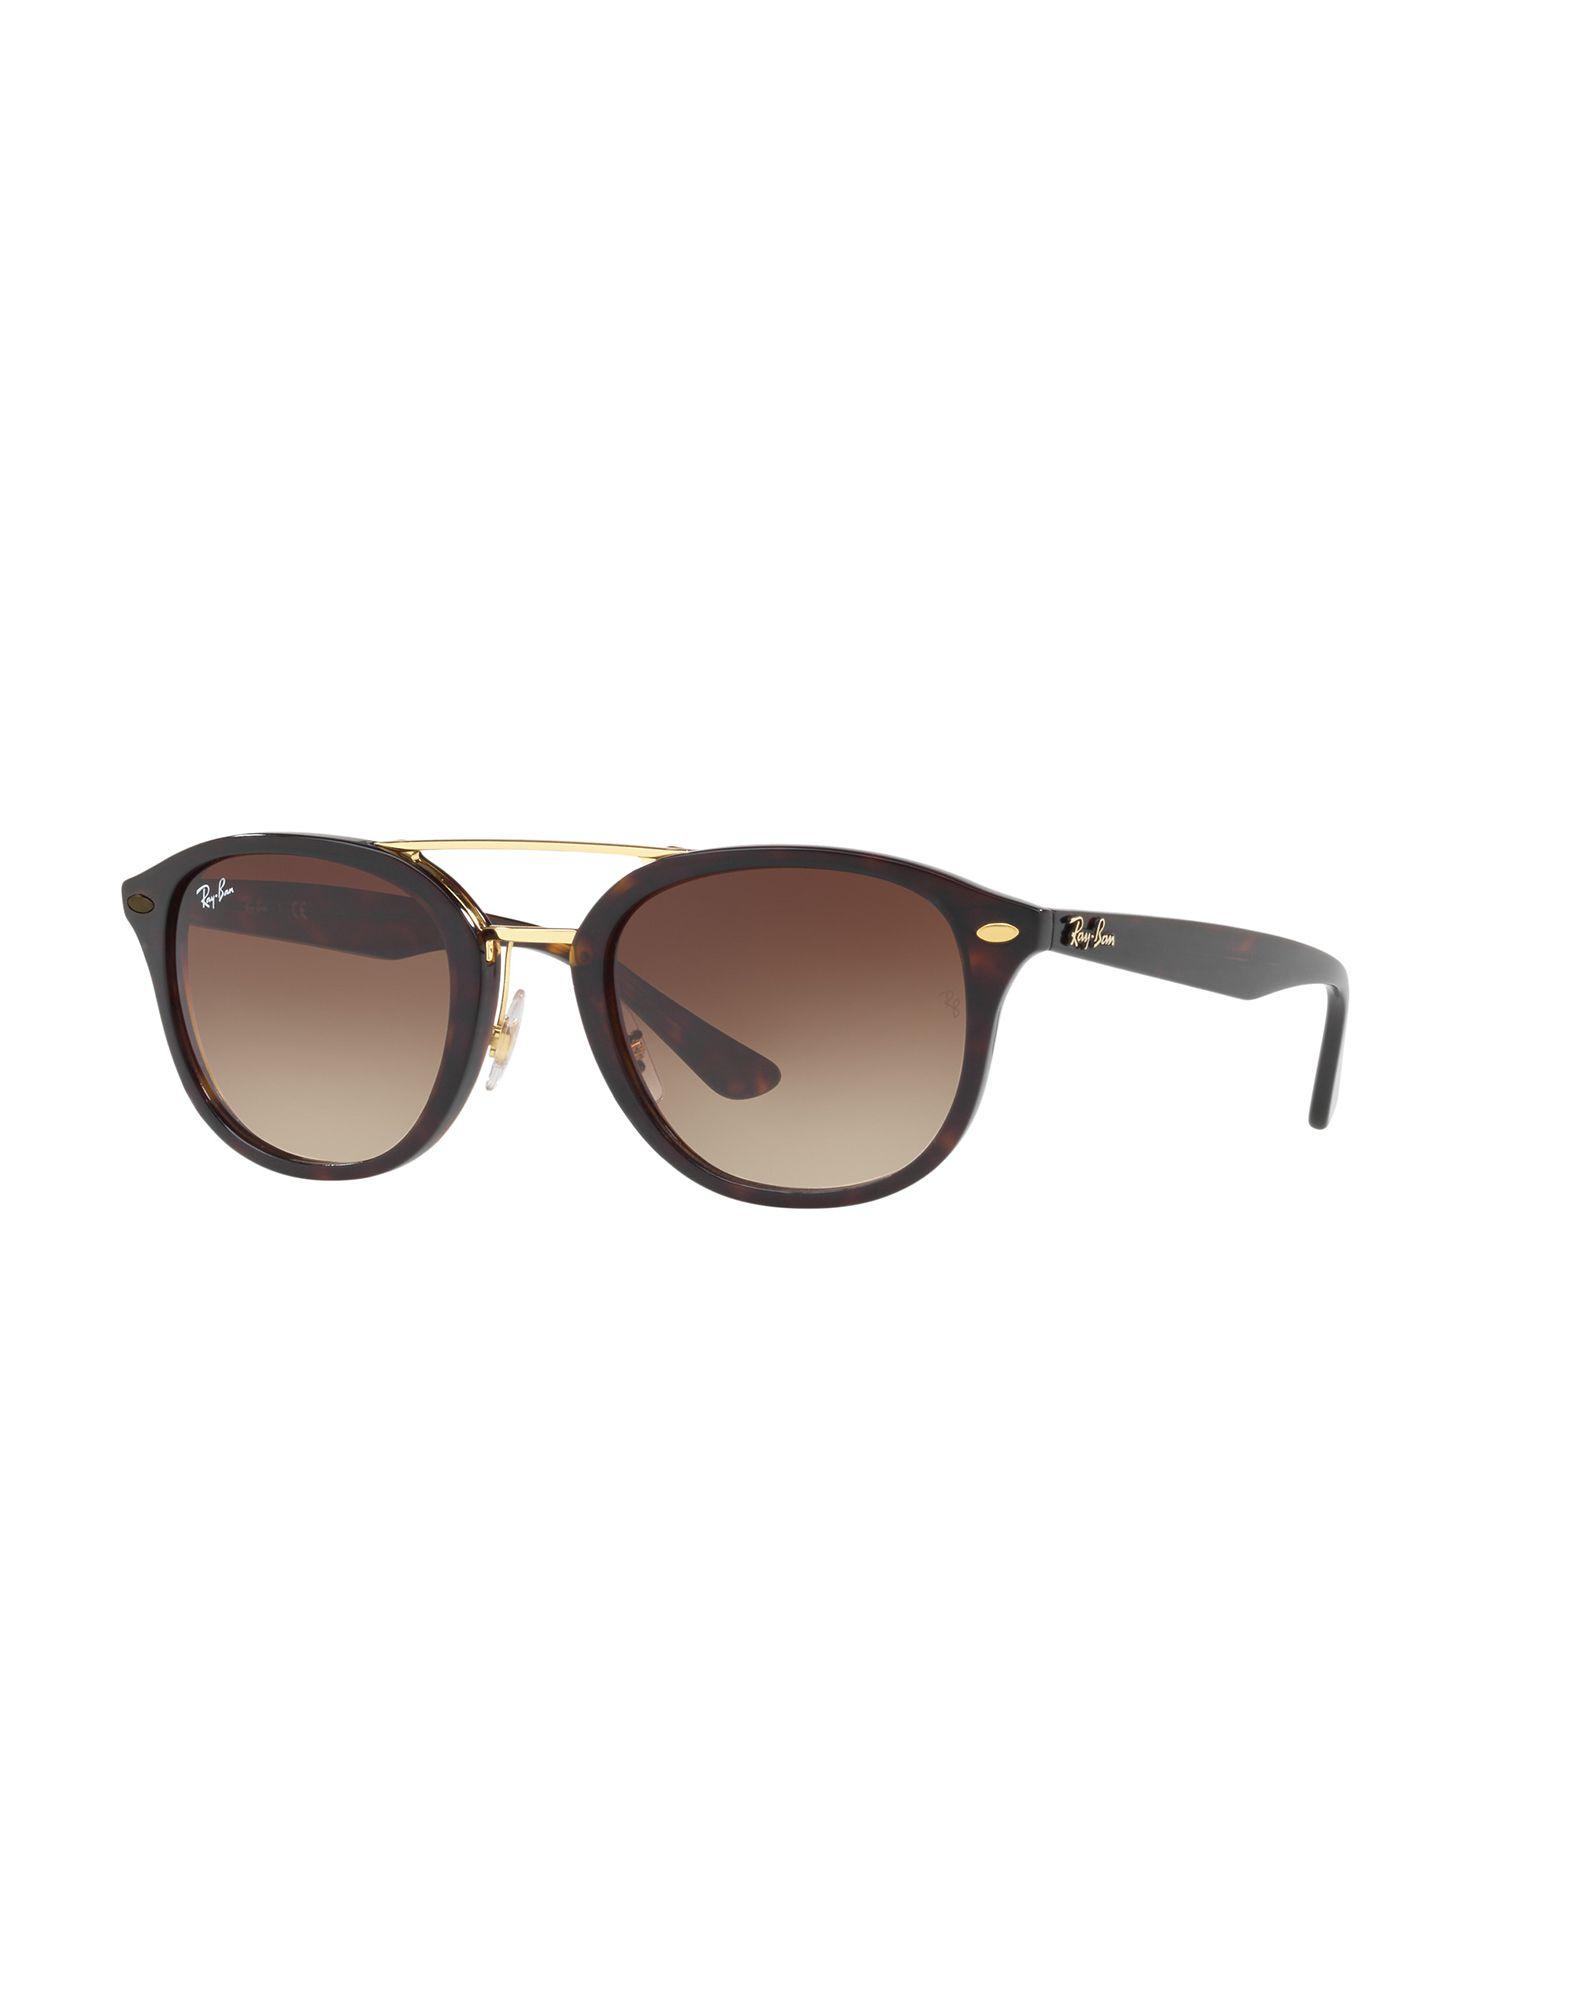 RAY-BAN Солнечные очки web eyewear солнечные очки